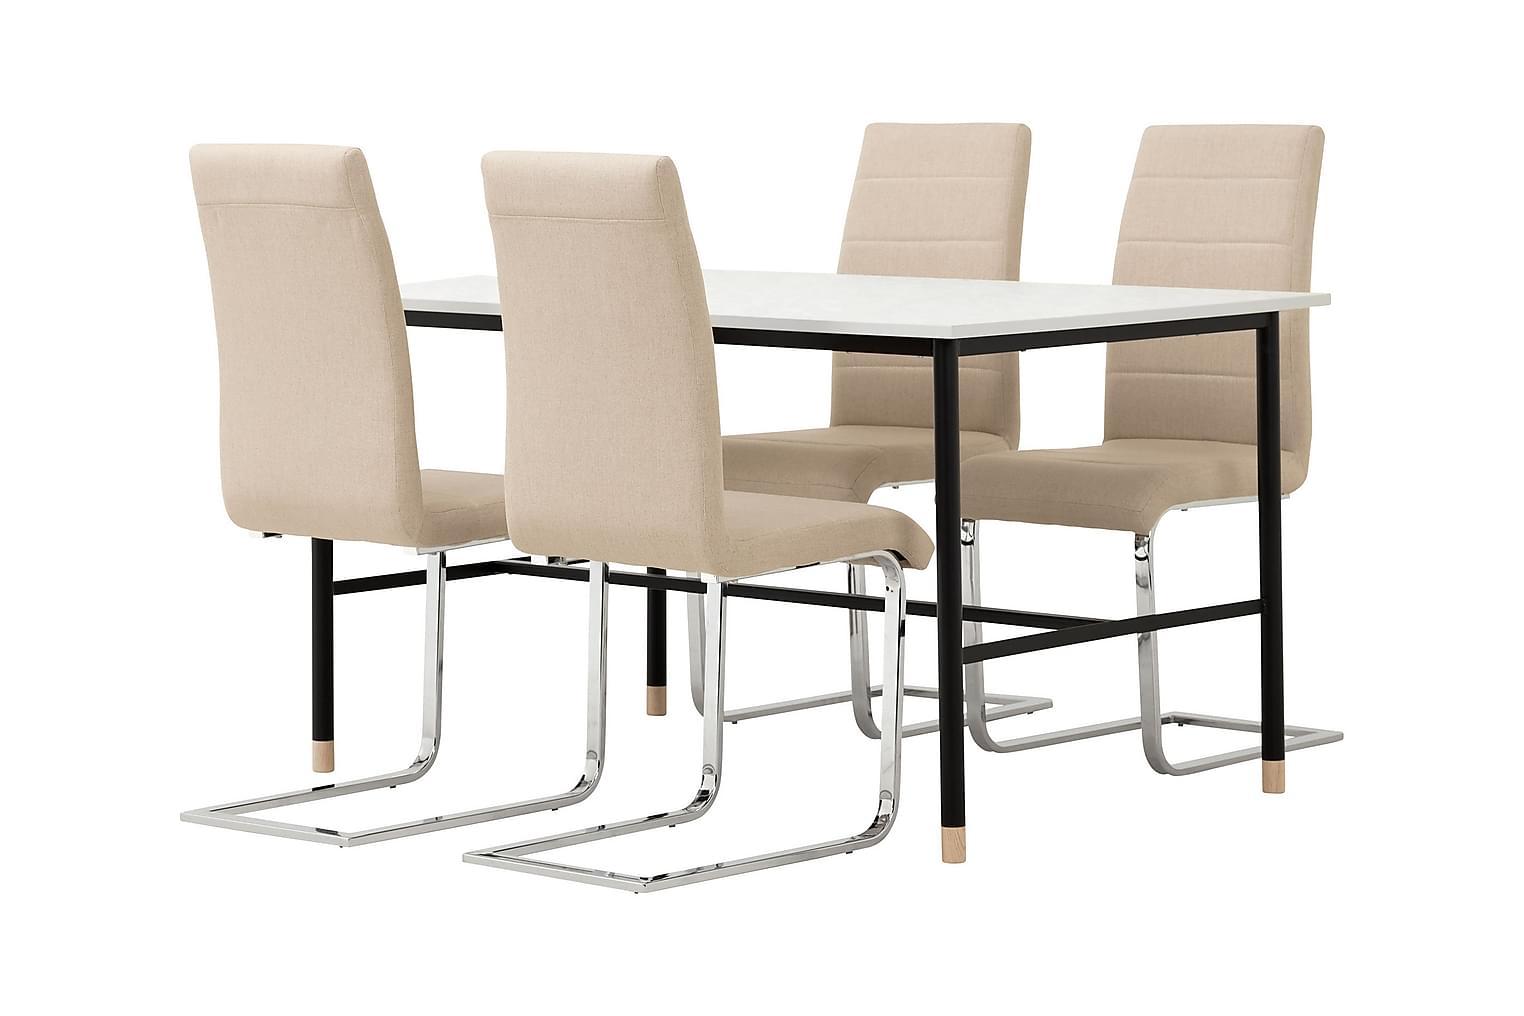 BRANDY Pöytä 138 Marmori + 4 EMÅN Tuolia Beige